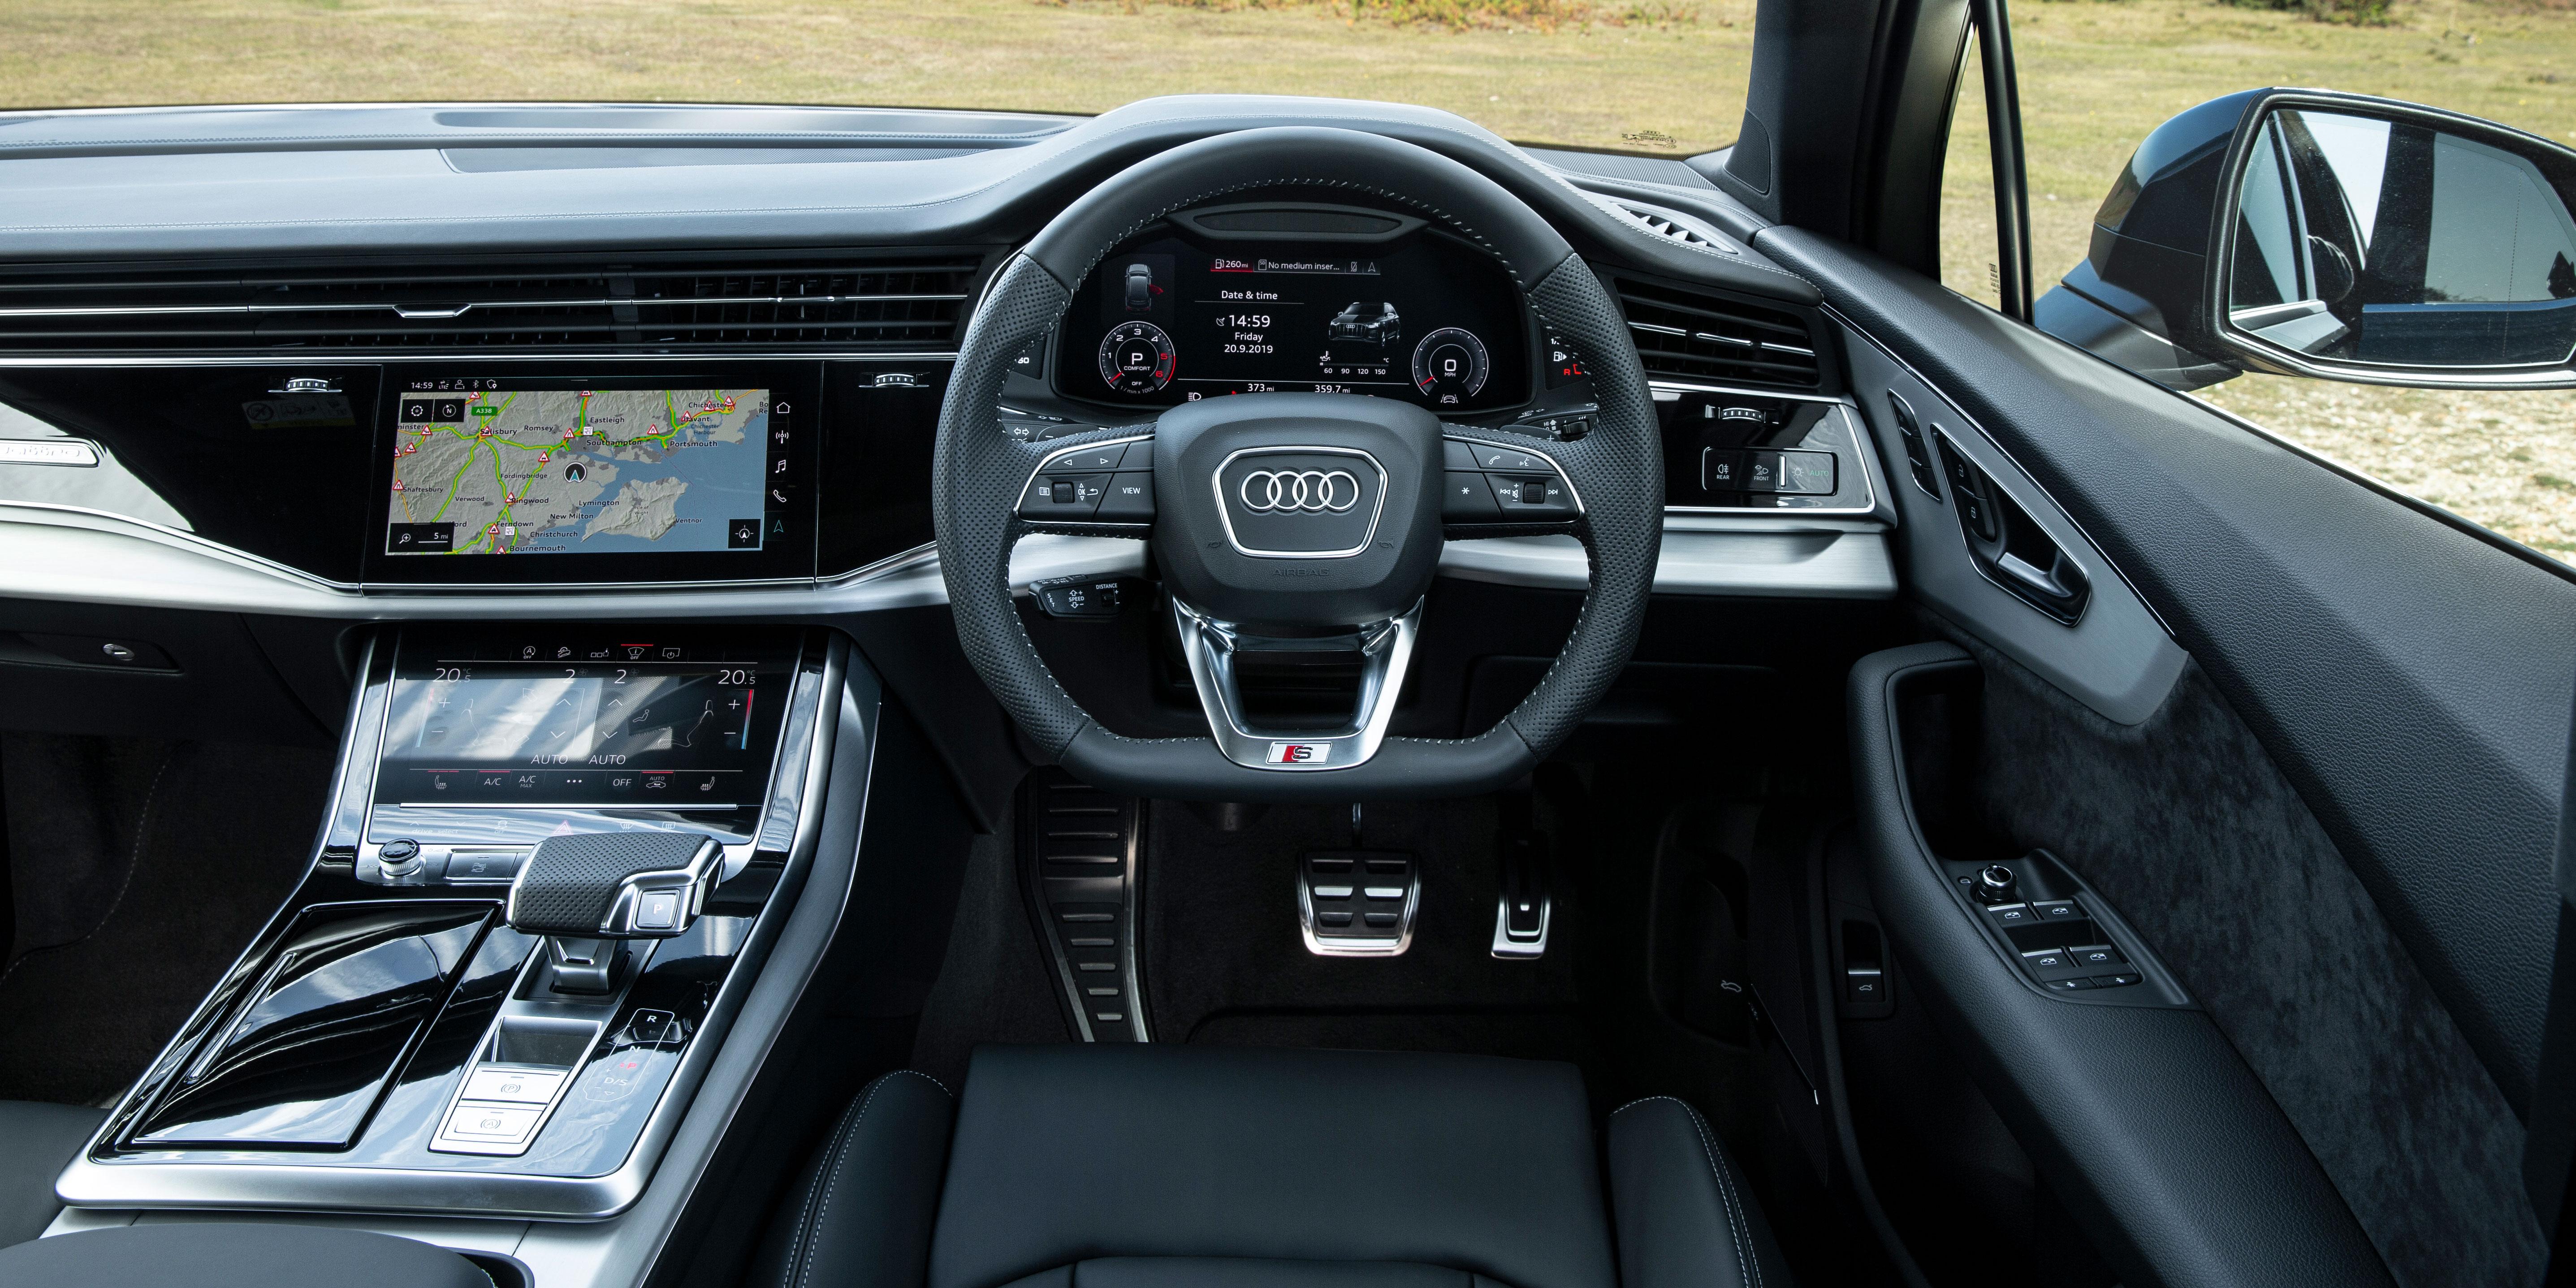 Audi Q7 Interior Infotainment Carwow